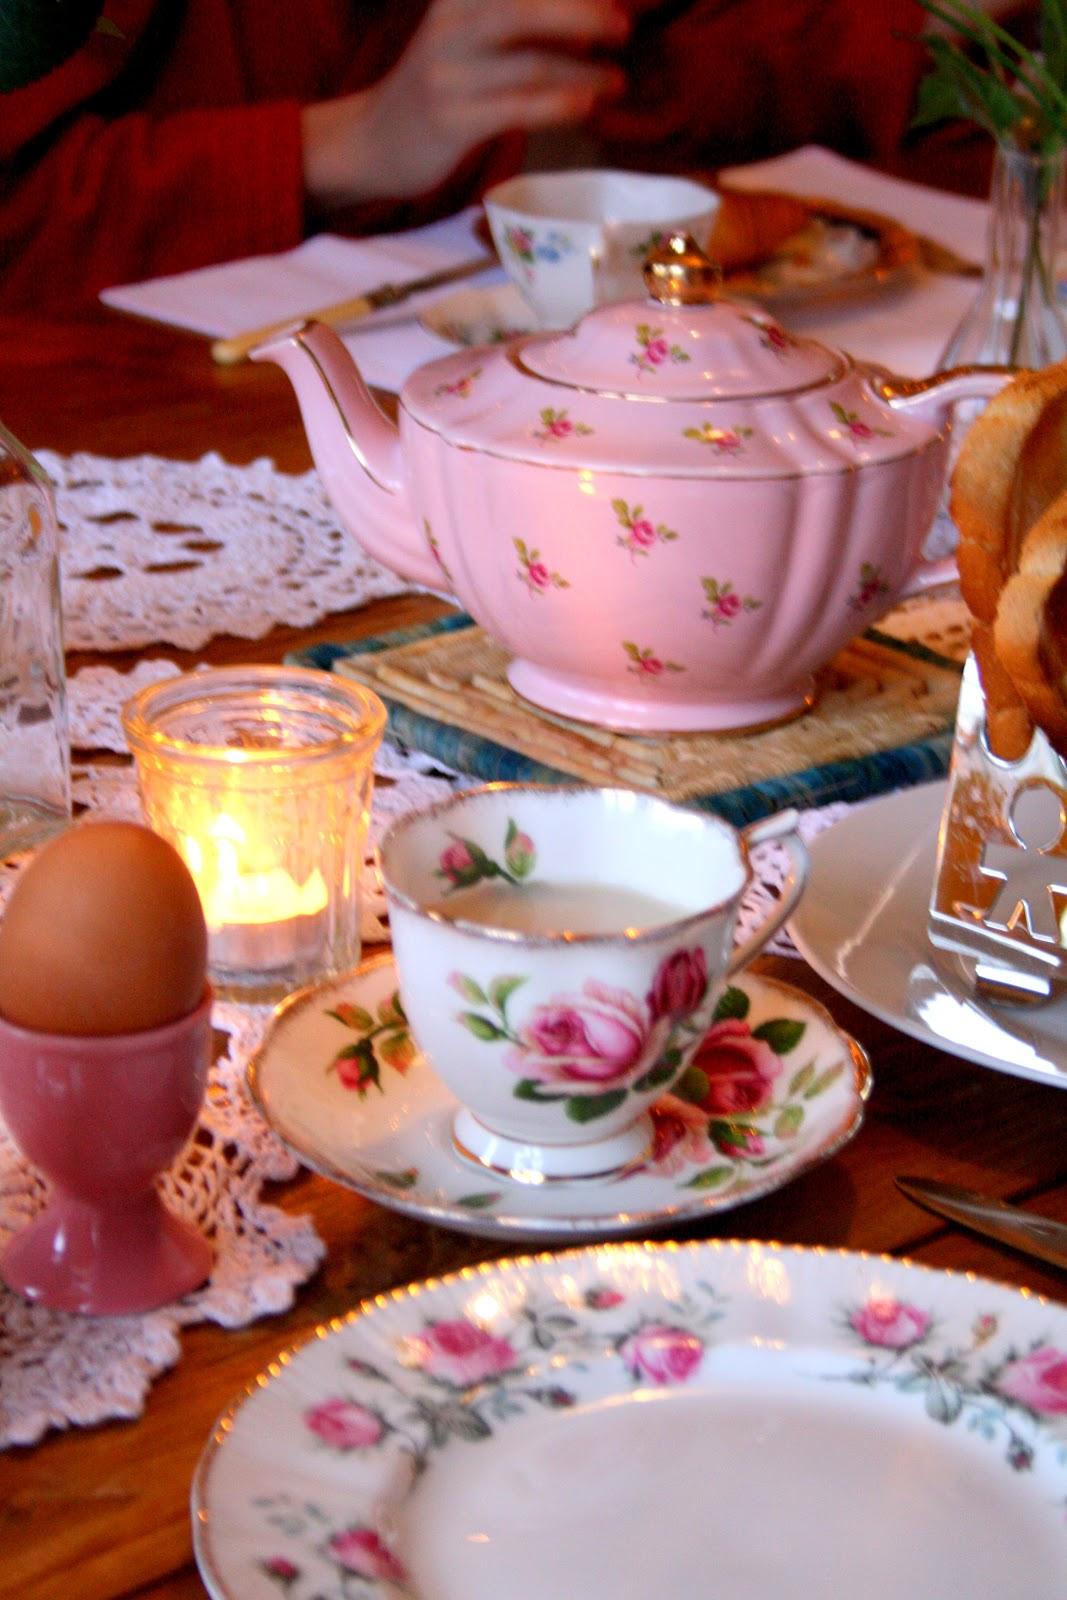 Good Morning Tea With Breakfast : Madelief vintage breakfast table